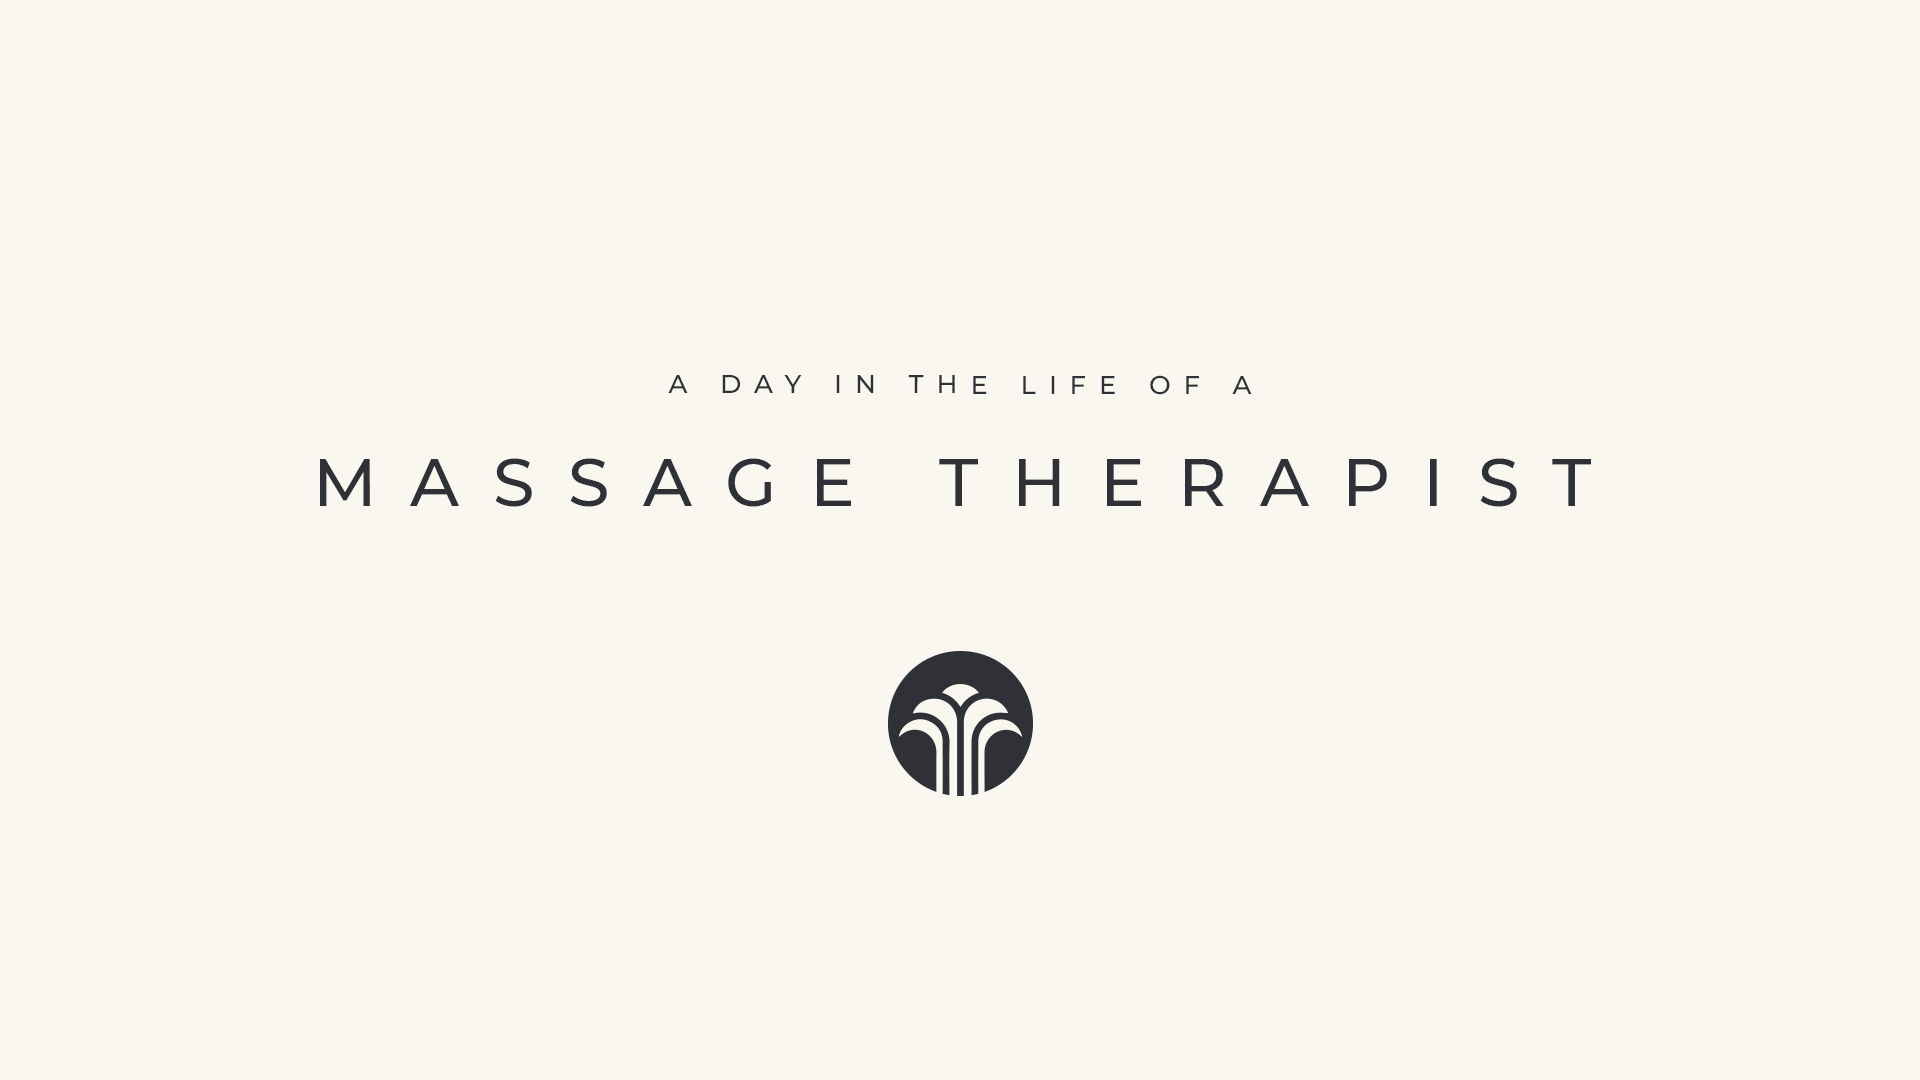 a day in the life of a massage therapist male mobile studio massage therapist nassau bahamas paradise island atlantis baha mar palm cay